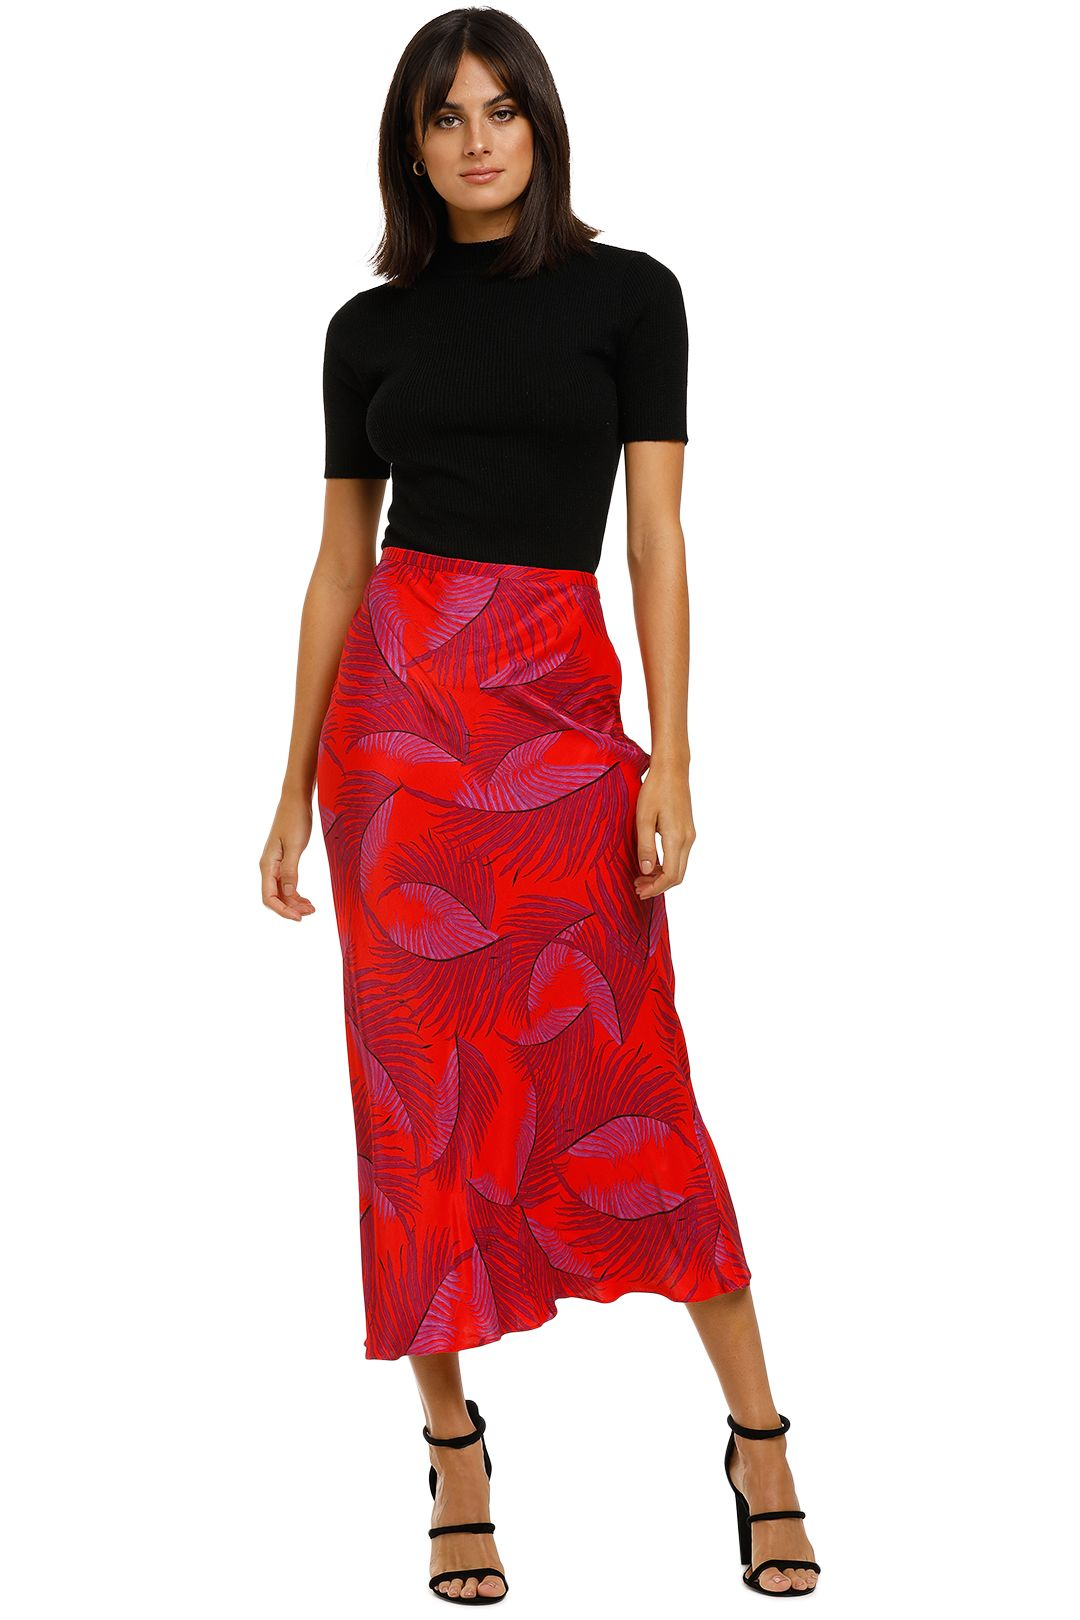 Shona-Joy-Phoenix-Bias-Skirt-Front